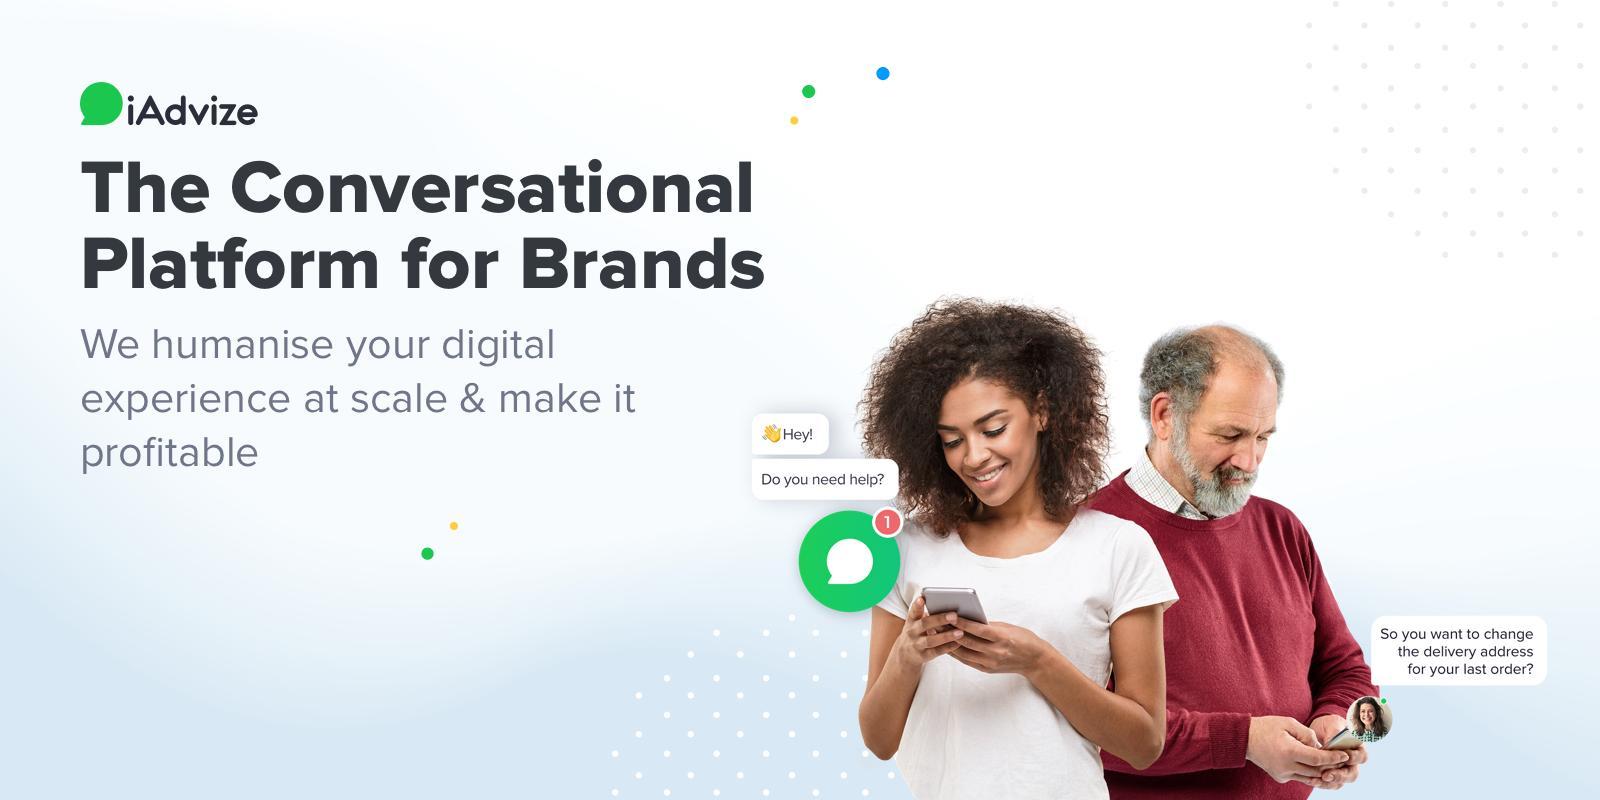 Review iAdvize: The Conversational Platform - Appvizer